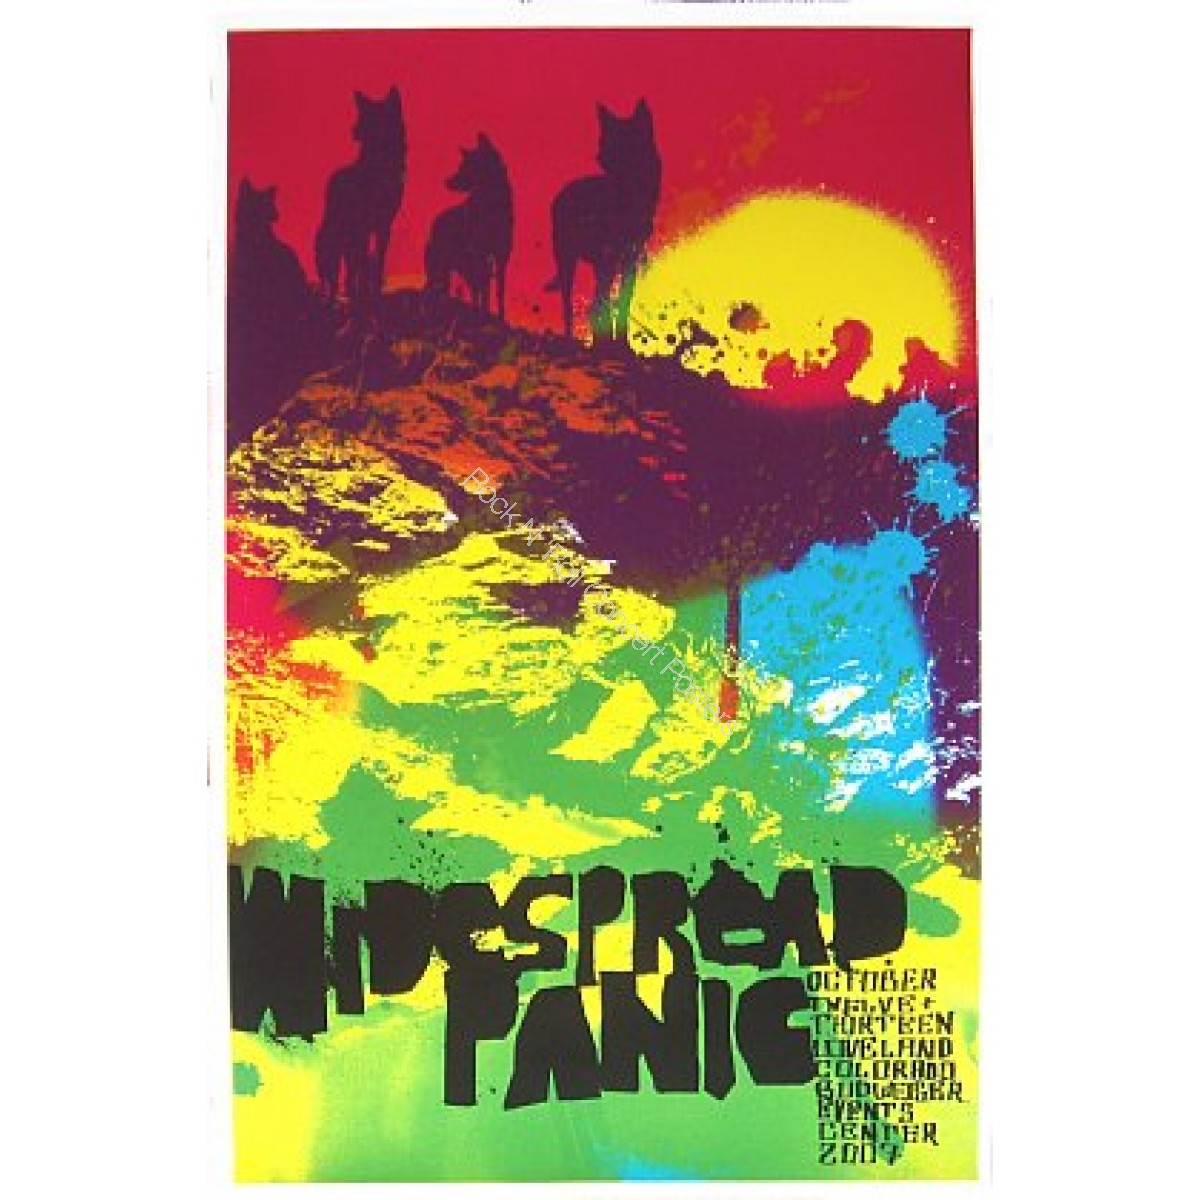 Widespread Panic Loveland Colorado 2007